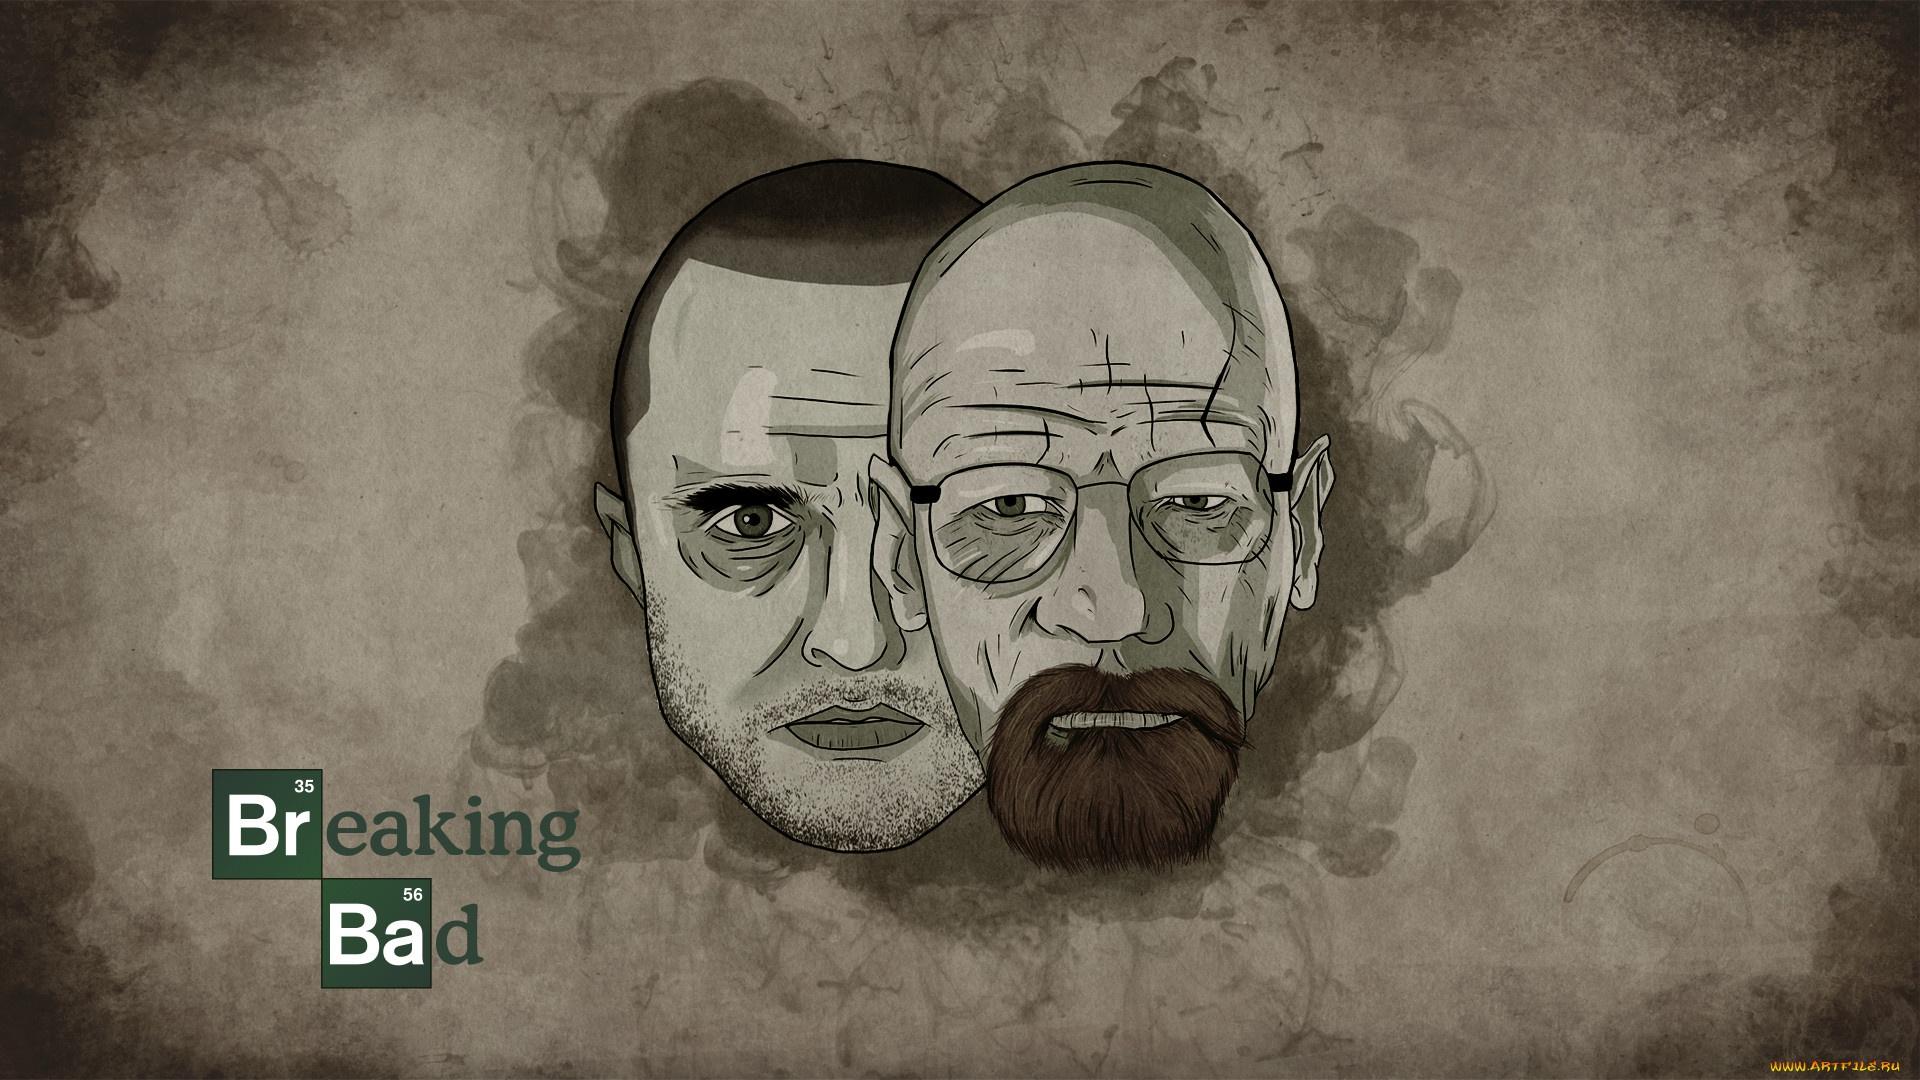 Breaking Bad free background